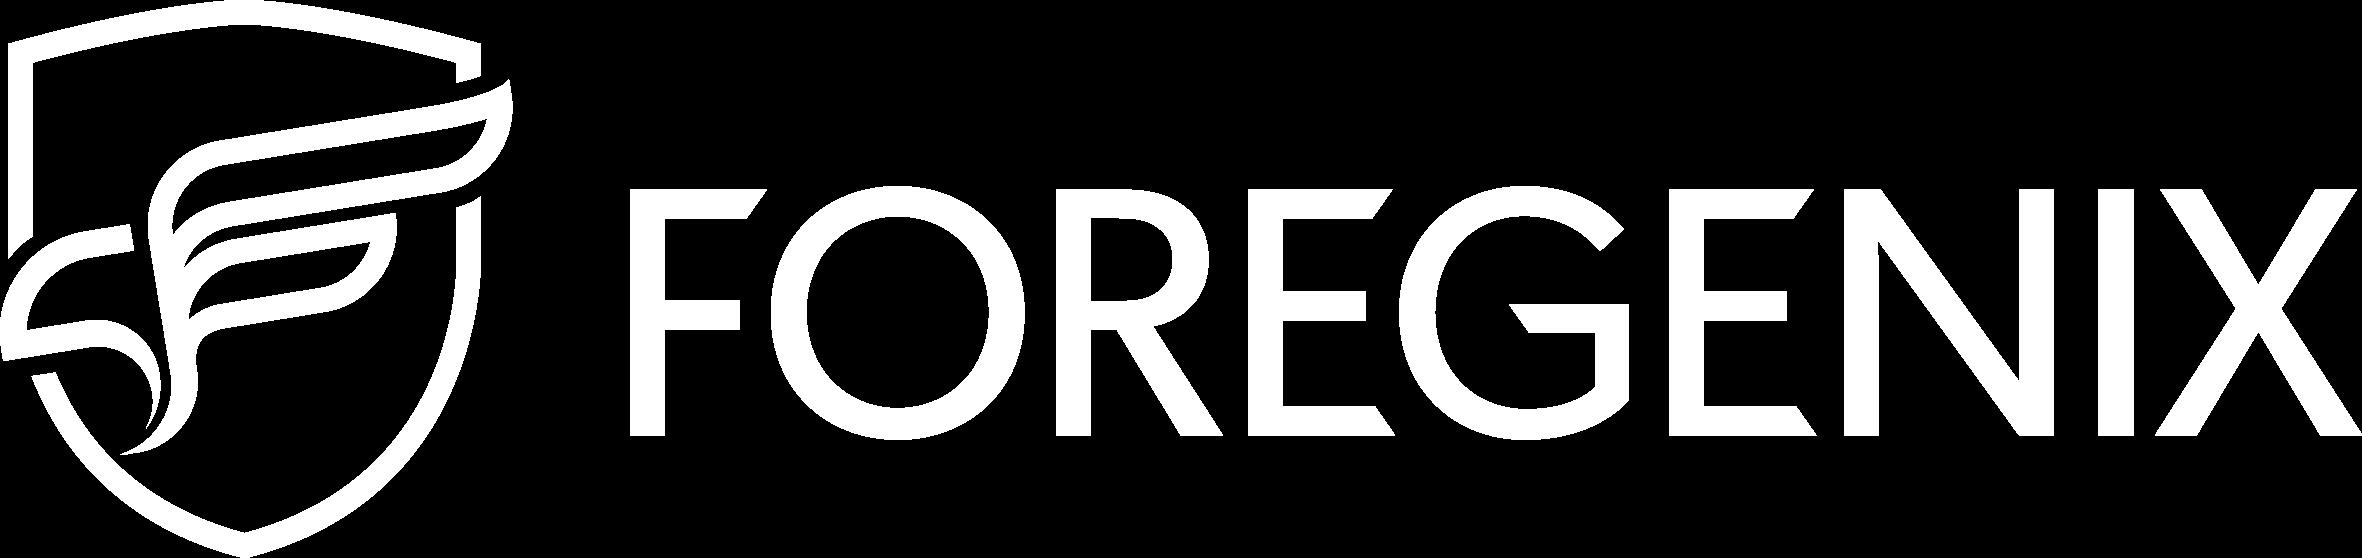 Foregenix